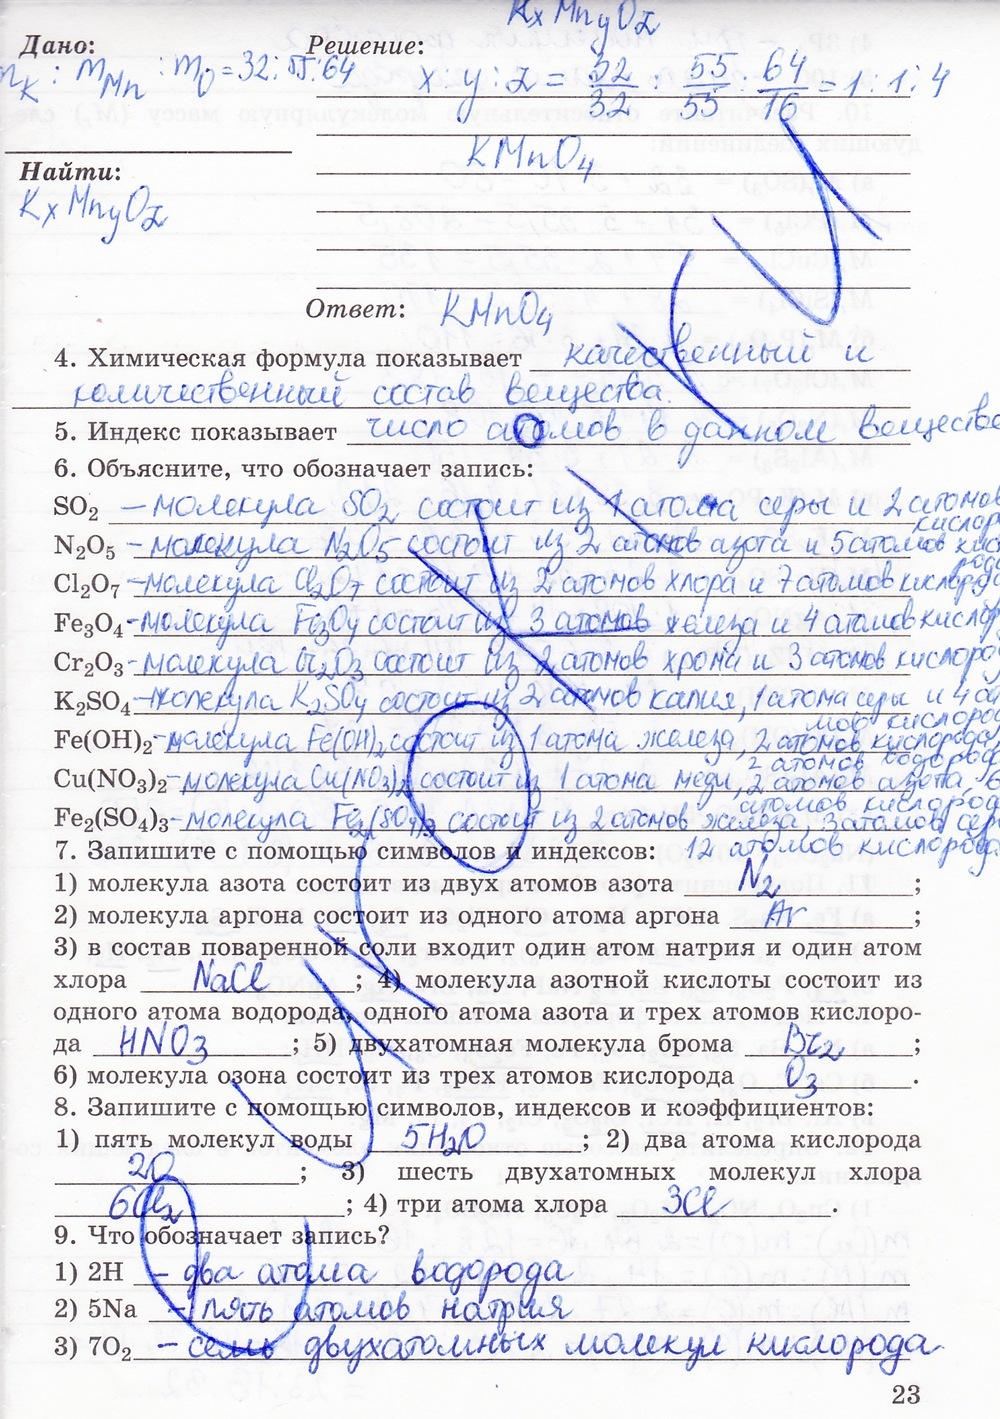 Гдз по химии 8 класс рудзитис страница 59 номер